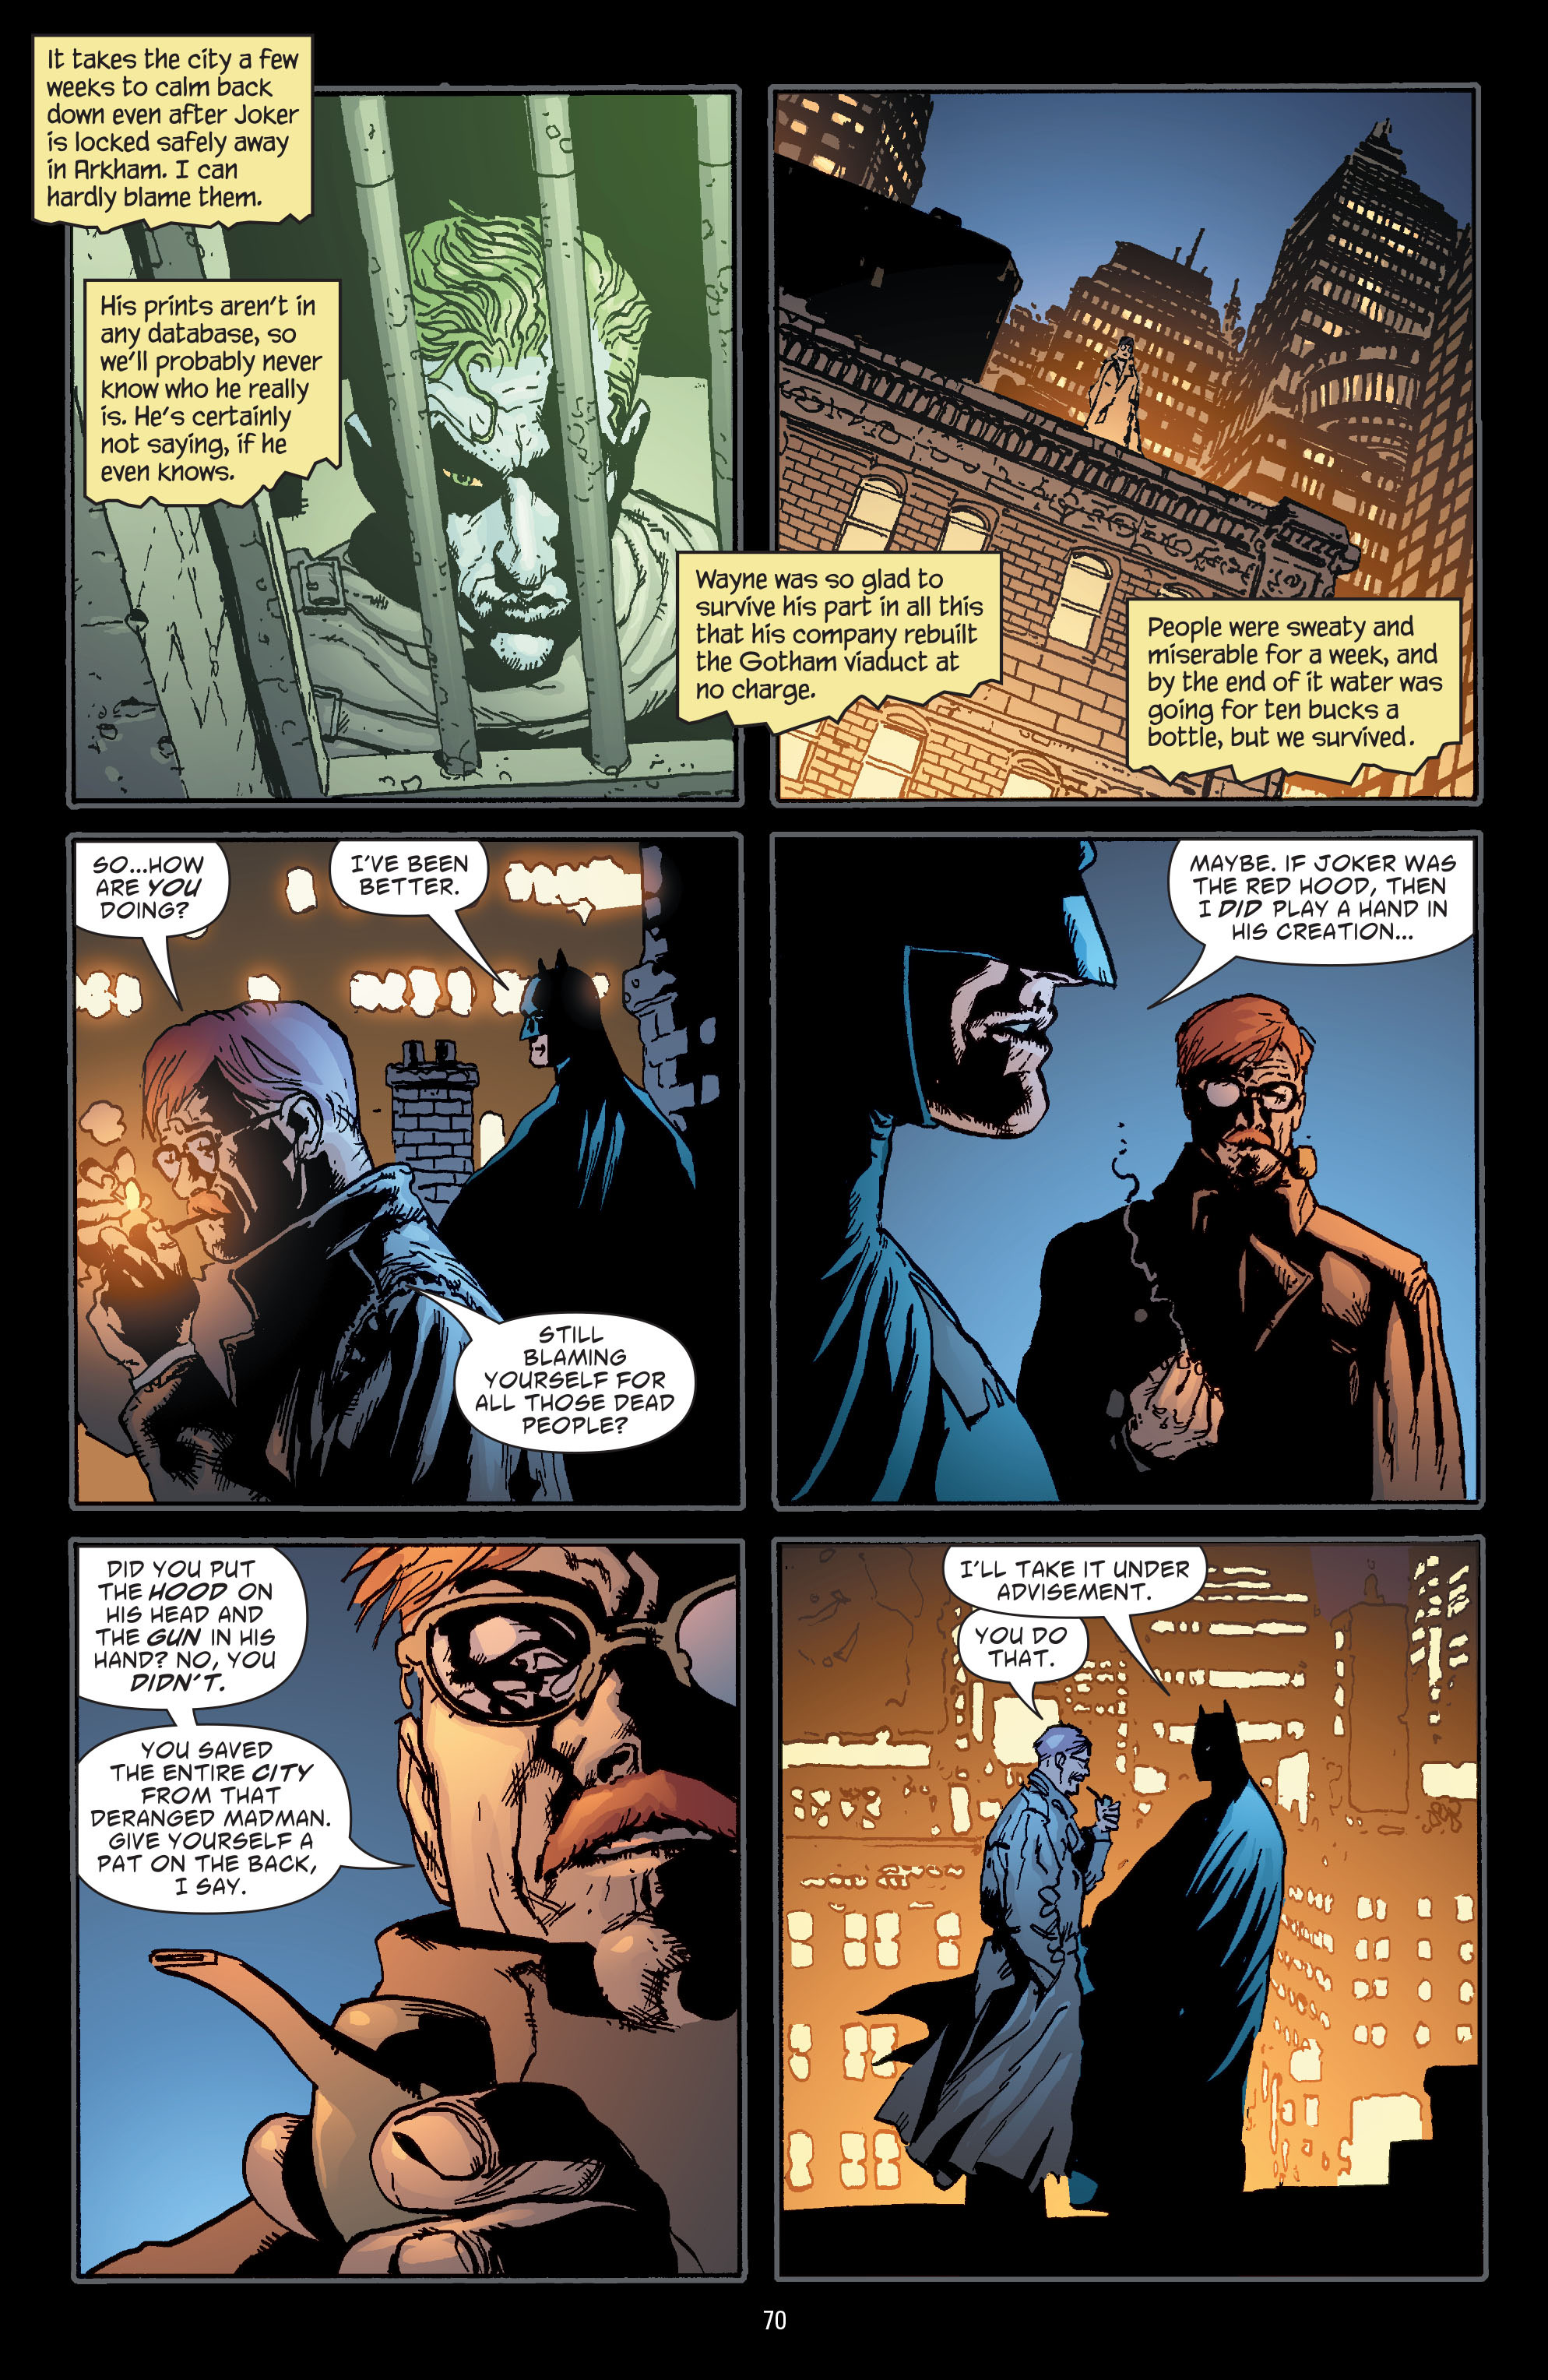 Psychology of Bruce Wayne MlqeAvafEJBPDPTX2ODSiVgGMprJ-J3kn8ejhy4AuM22aHrw3XuLpQp3vHlvmGOj3oxEO4ywlSnK=s0